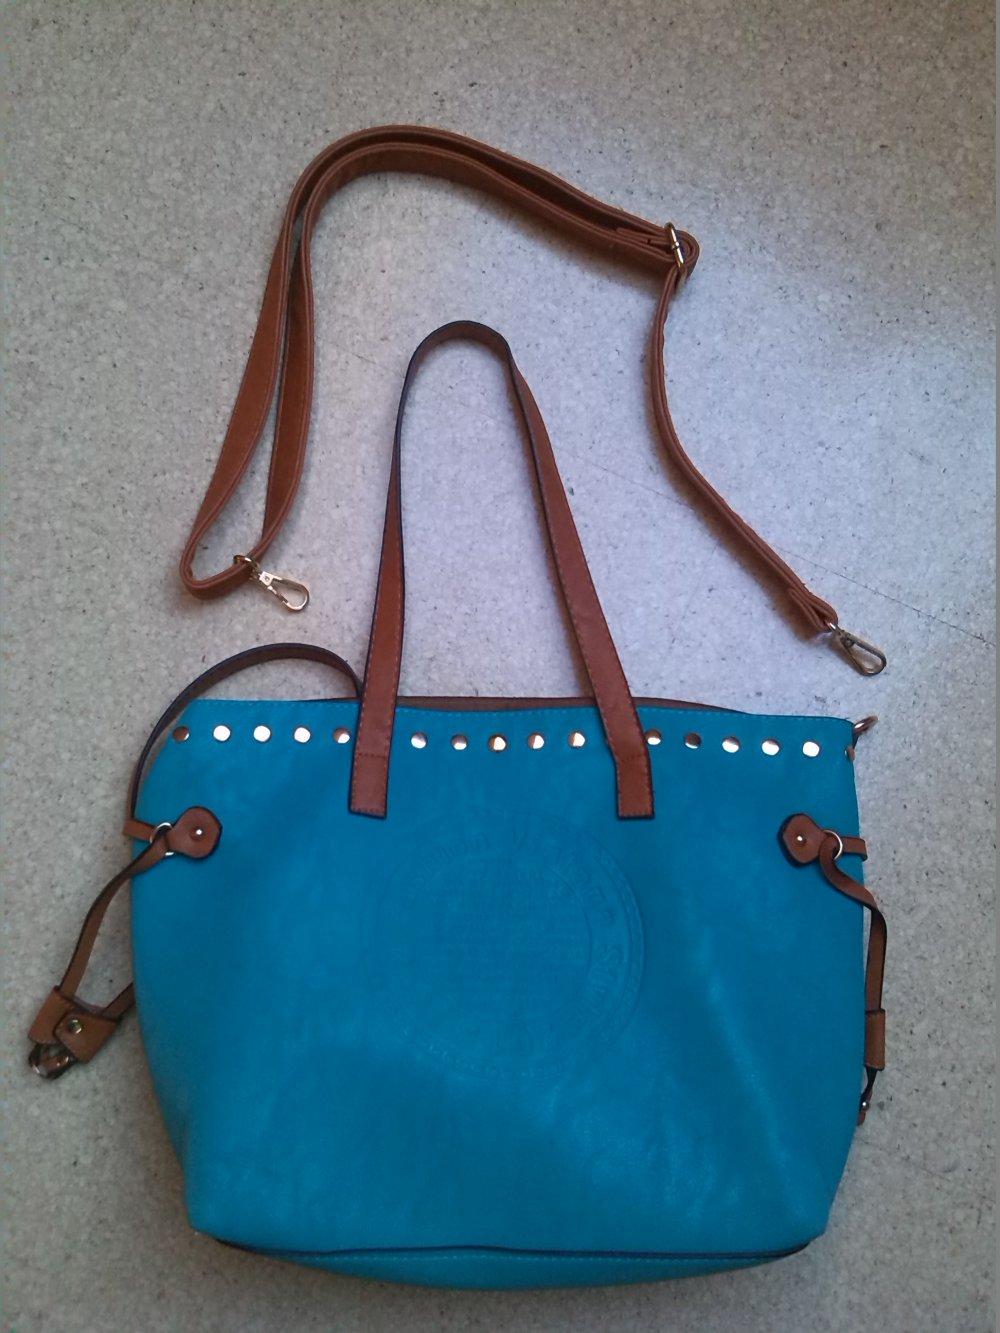 e42804146202f ... Tasche Handtasche Shopper türkis braun blau Umghängetasche Kunstleder  ...